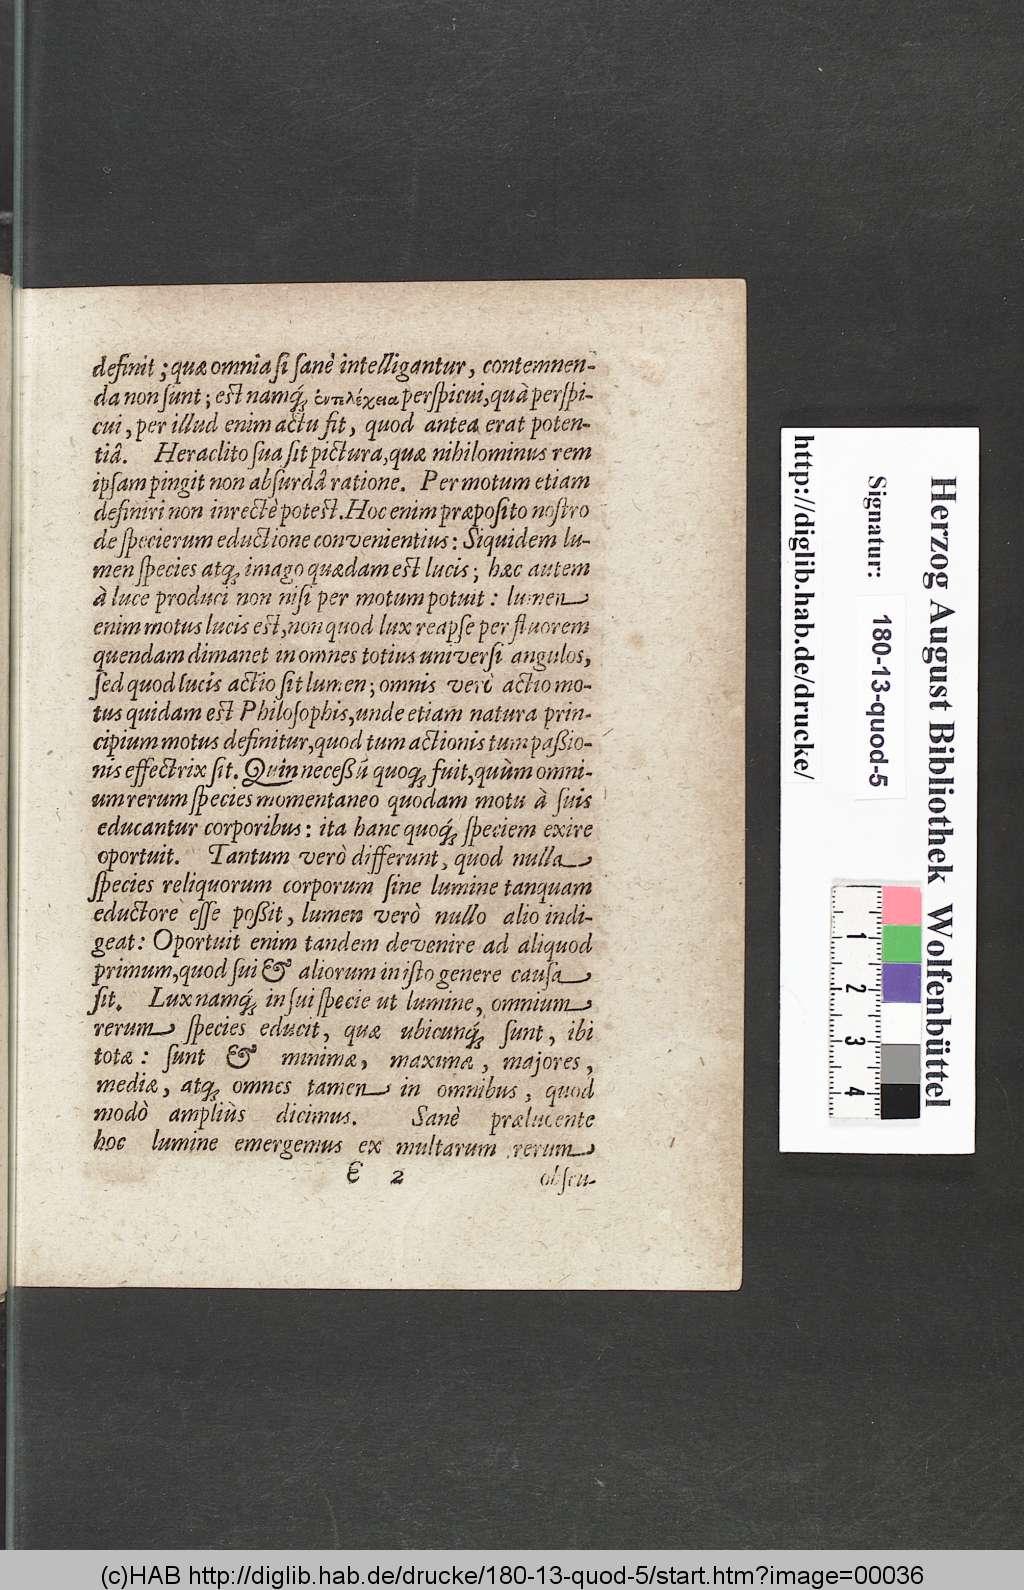 http://diglib.hab.de/drucke/180-13-quod-5/00036.jpg